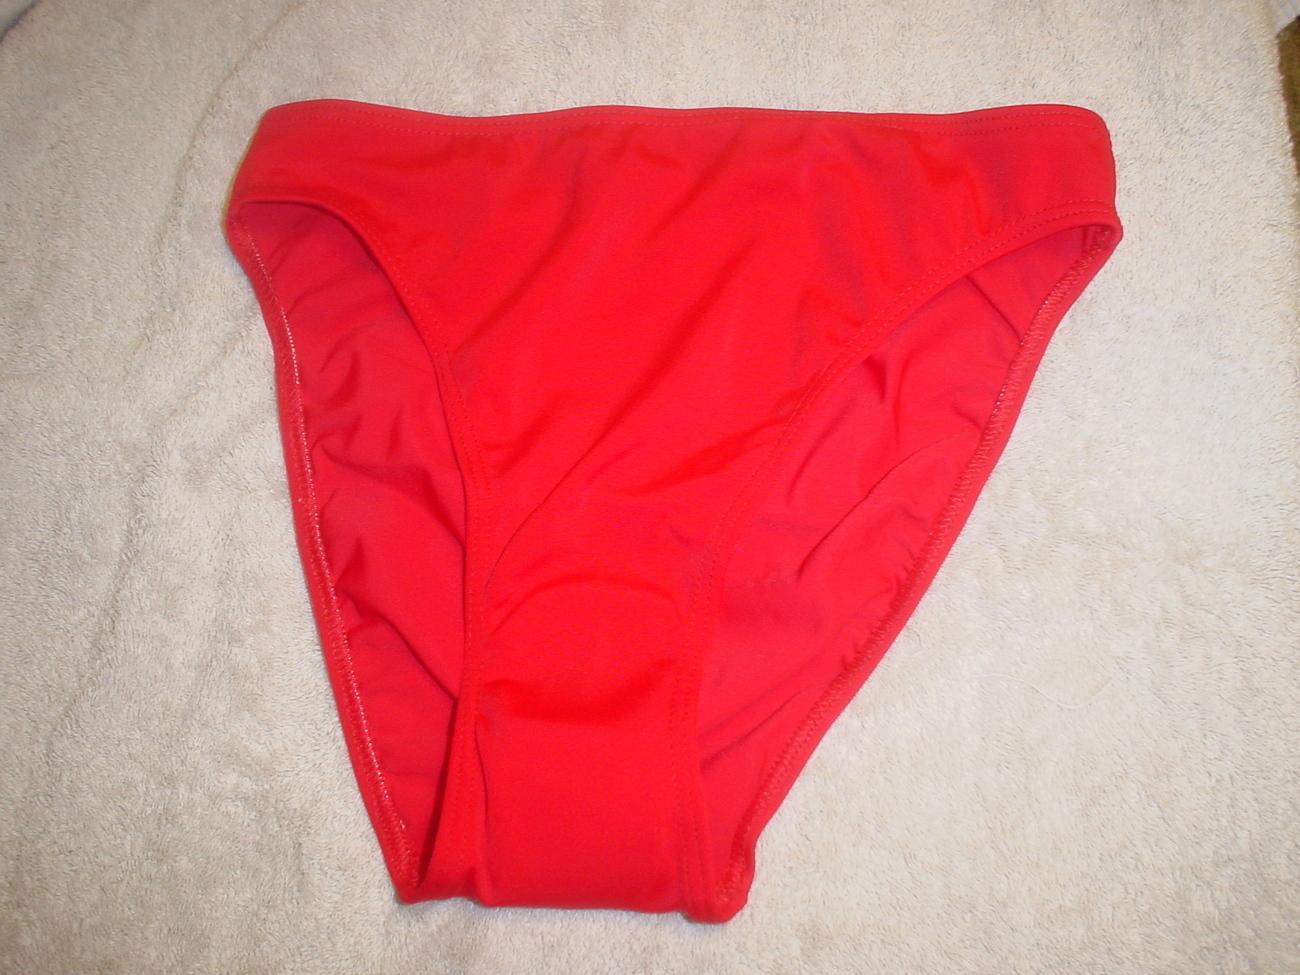 Club Med Tanki Bikini Red/White/Navy Size Large NWT